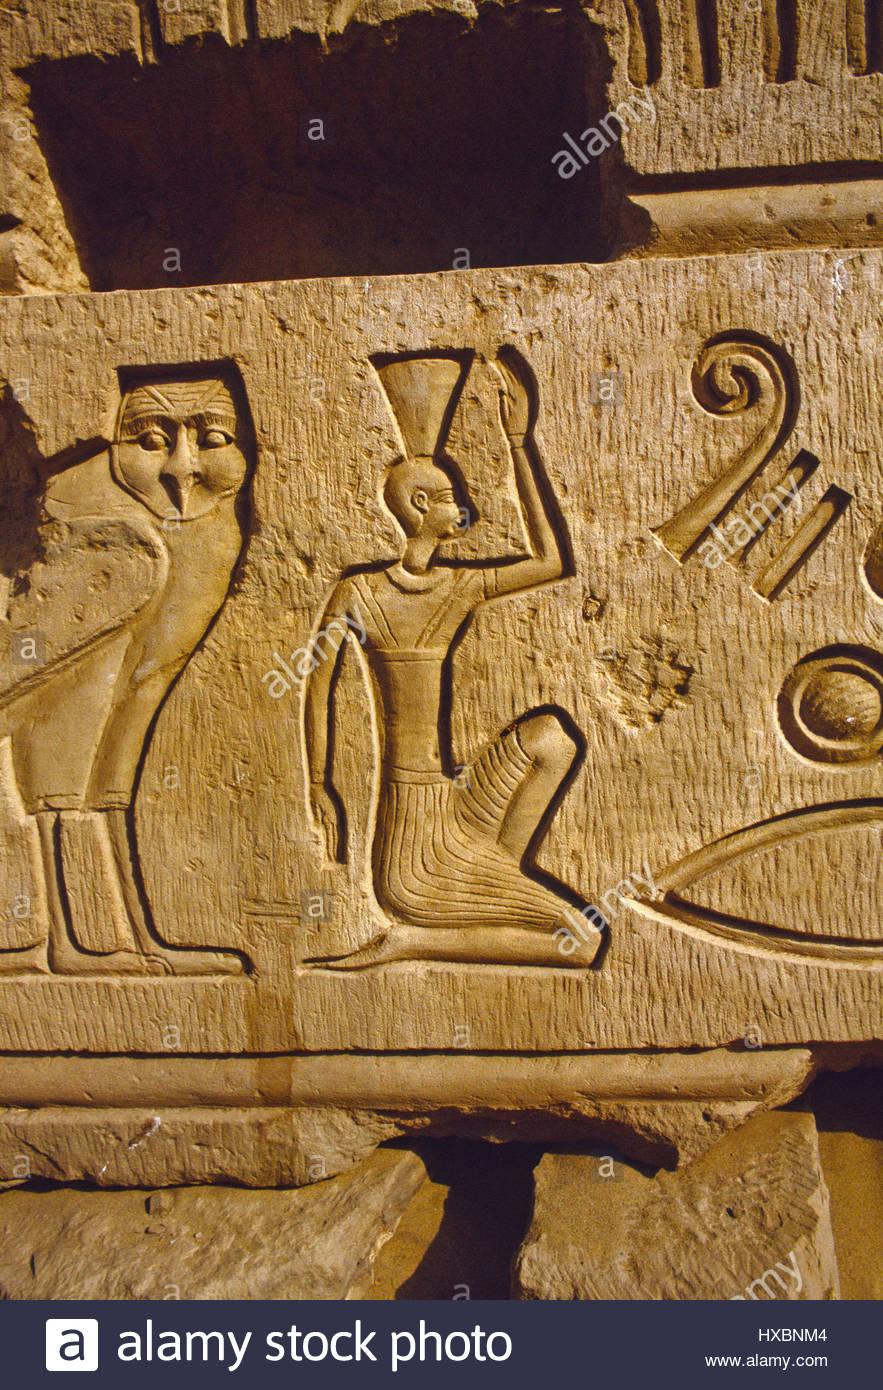 Kom ombo temple egyptian hieroglyphics carvings clear symbols owl kom ombo temple egyptian hieroglyphics carvings clear symbols owl woman seated of this beautiful ruined temple biocorpaavc